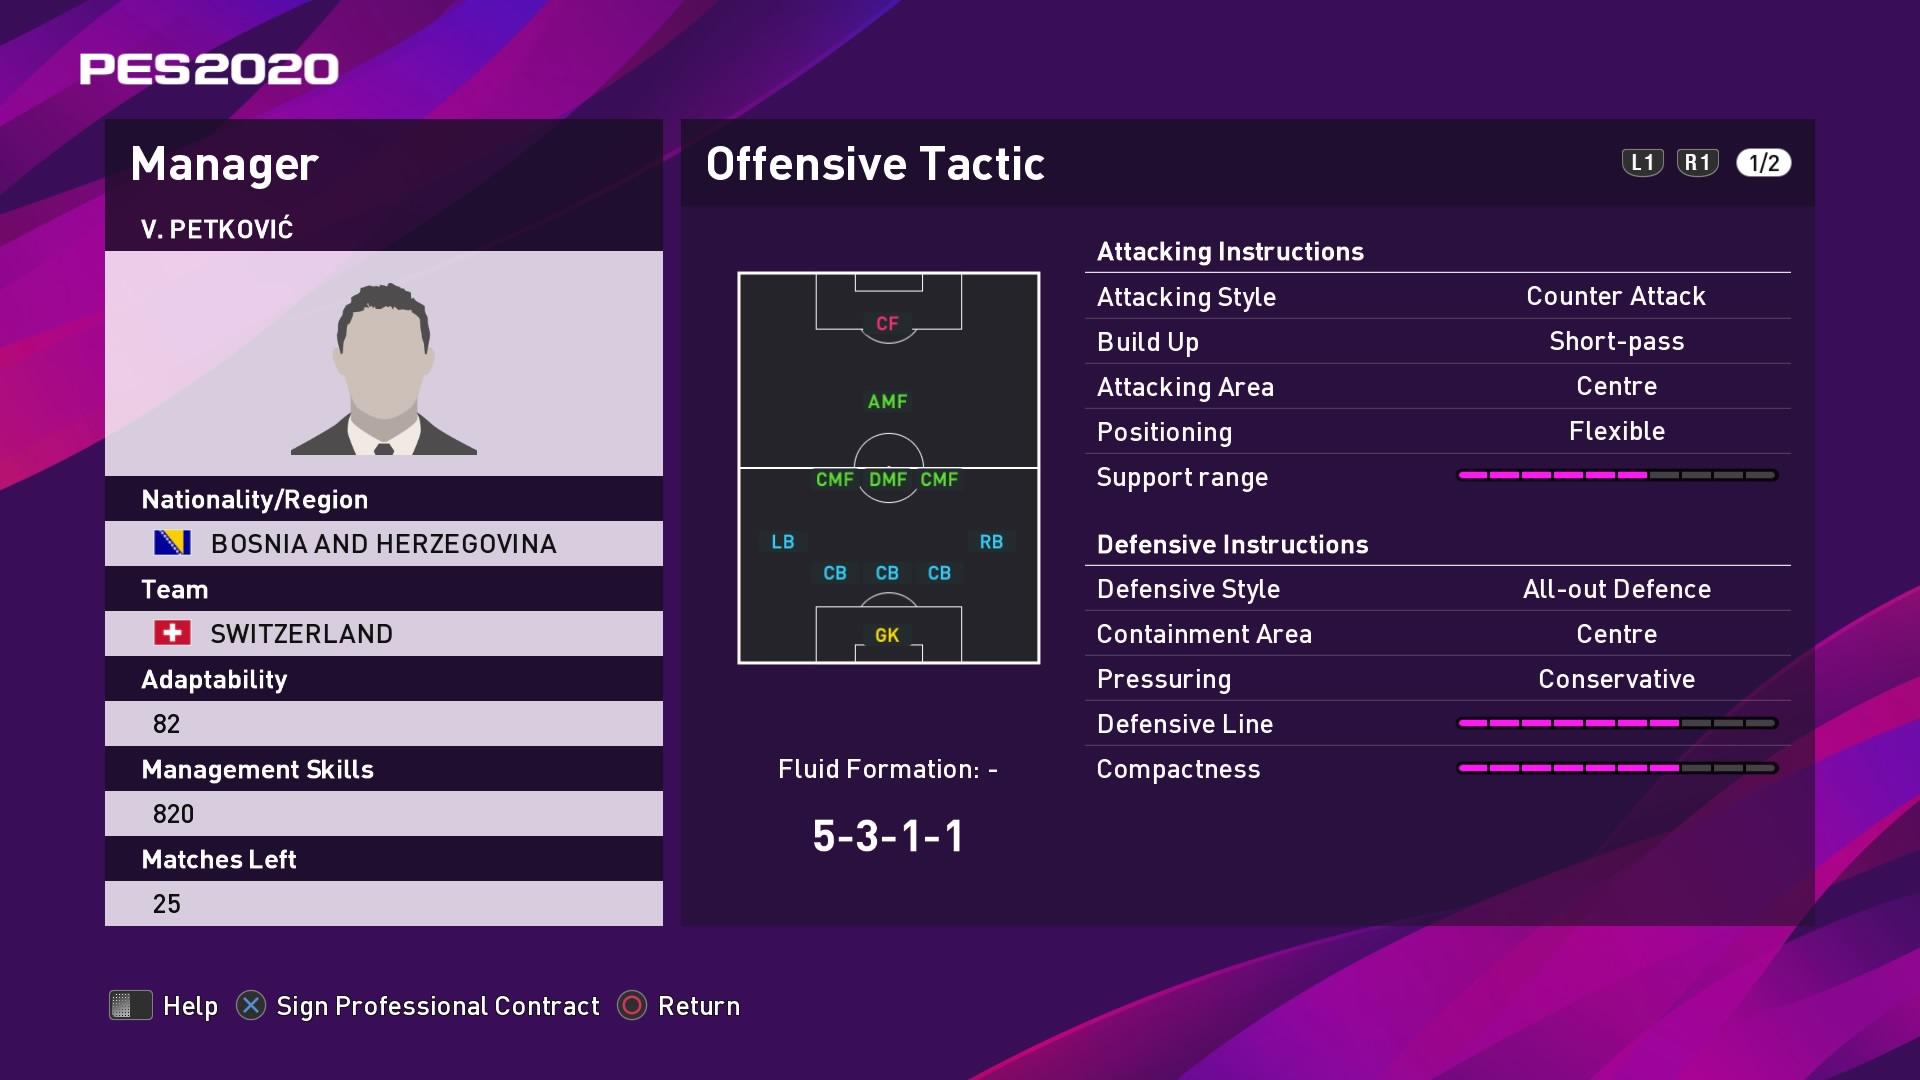 V. Petković (Vladimir Petković) Offensive Tactic in PES 2020 myClub